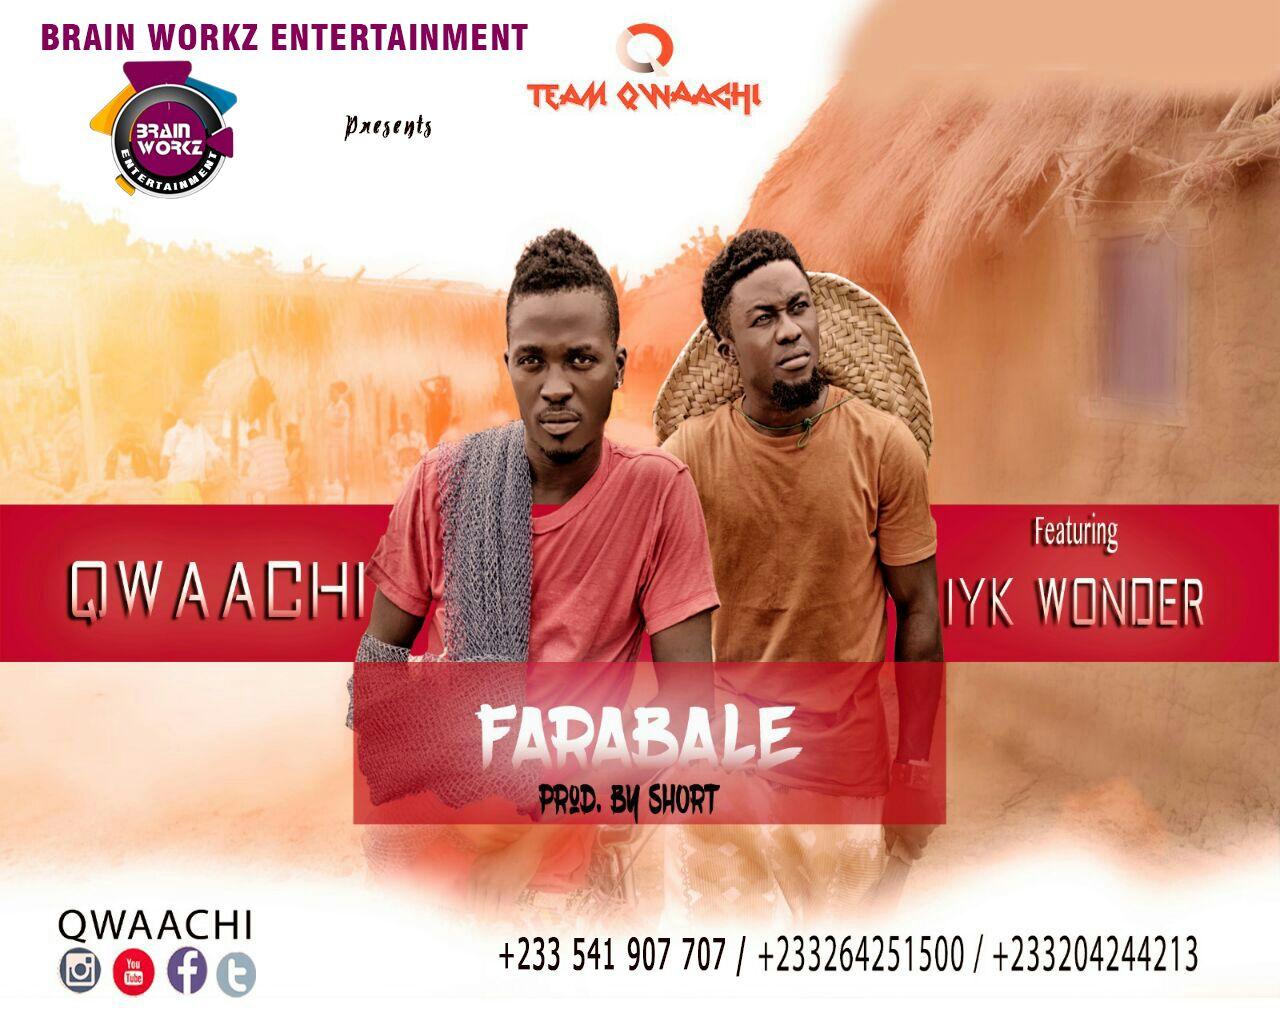 Qwaachi Farabale Ft Iyk Wonder Prod By Short